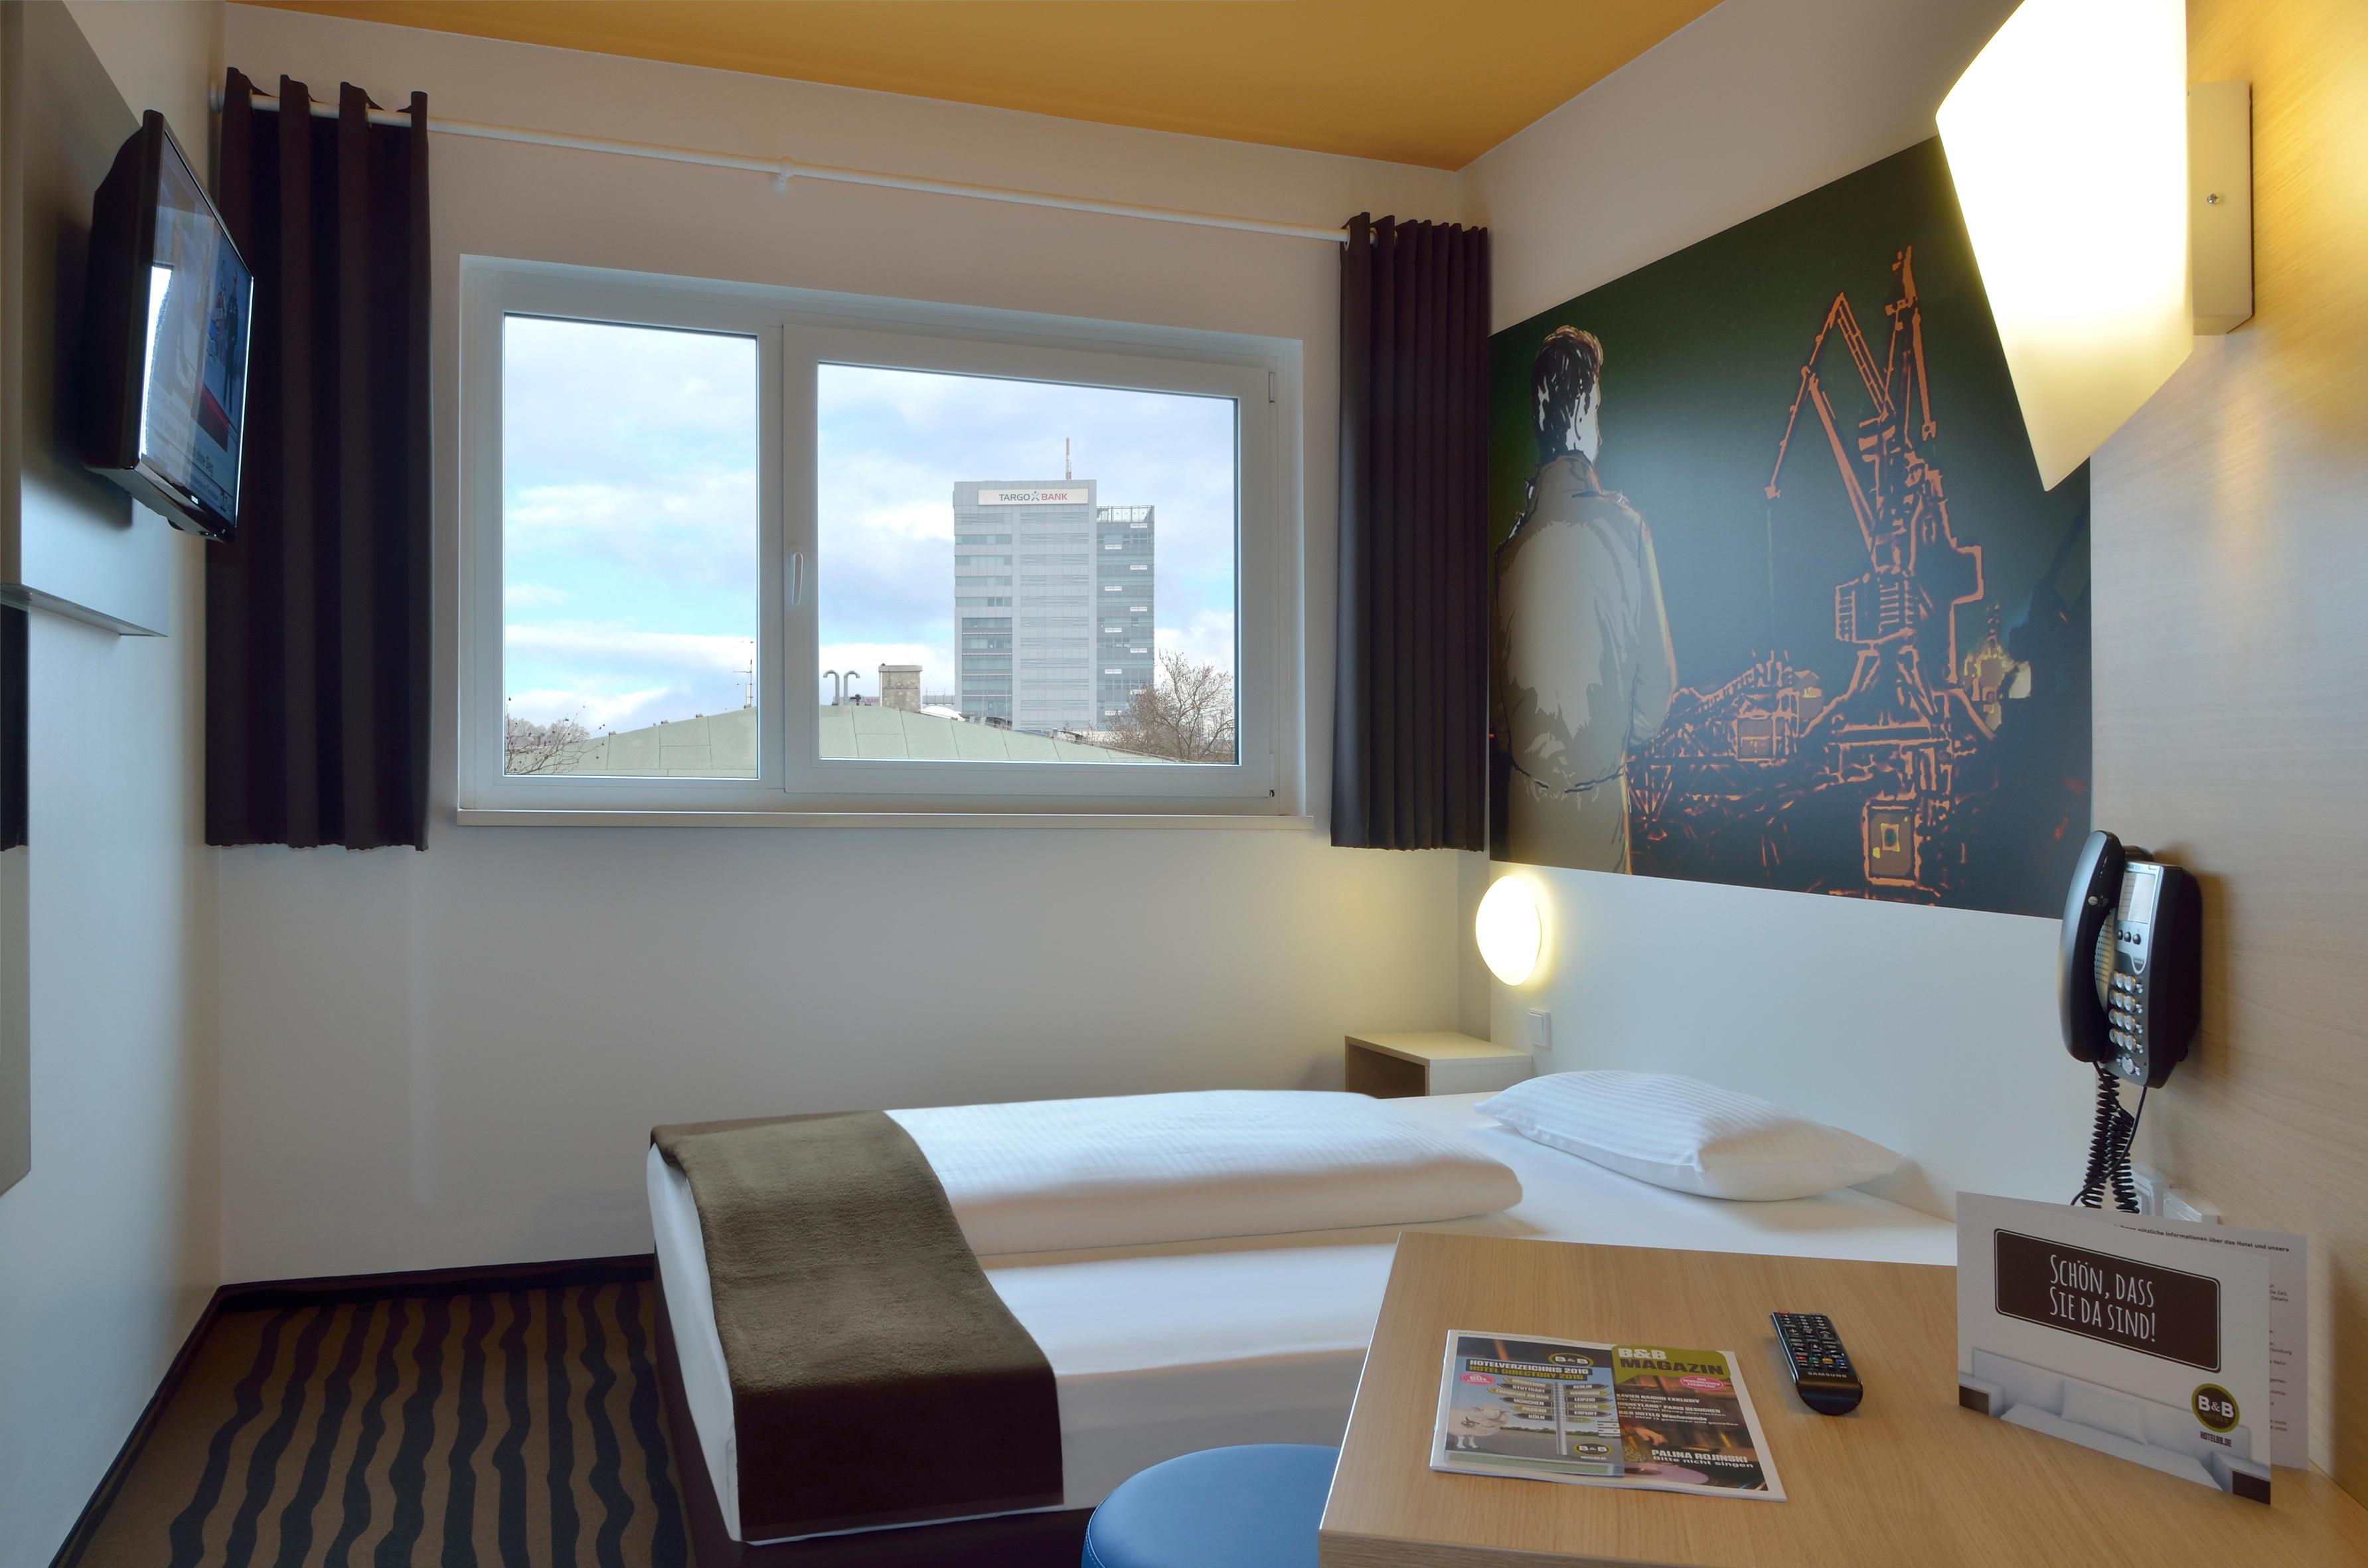 B B Hotel Duisburg In 47051 Duisburg